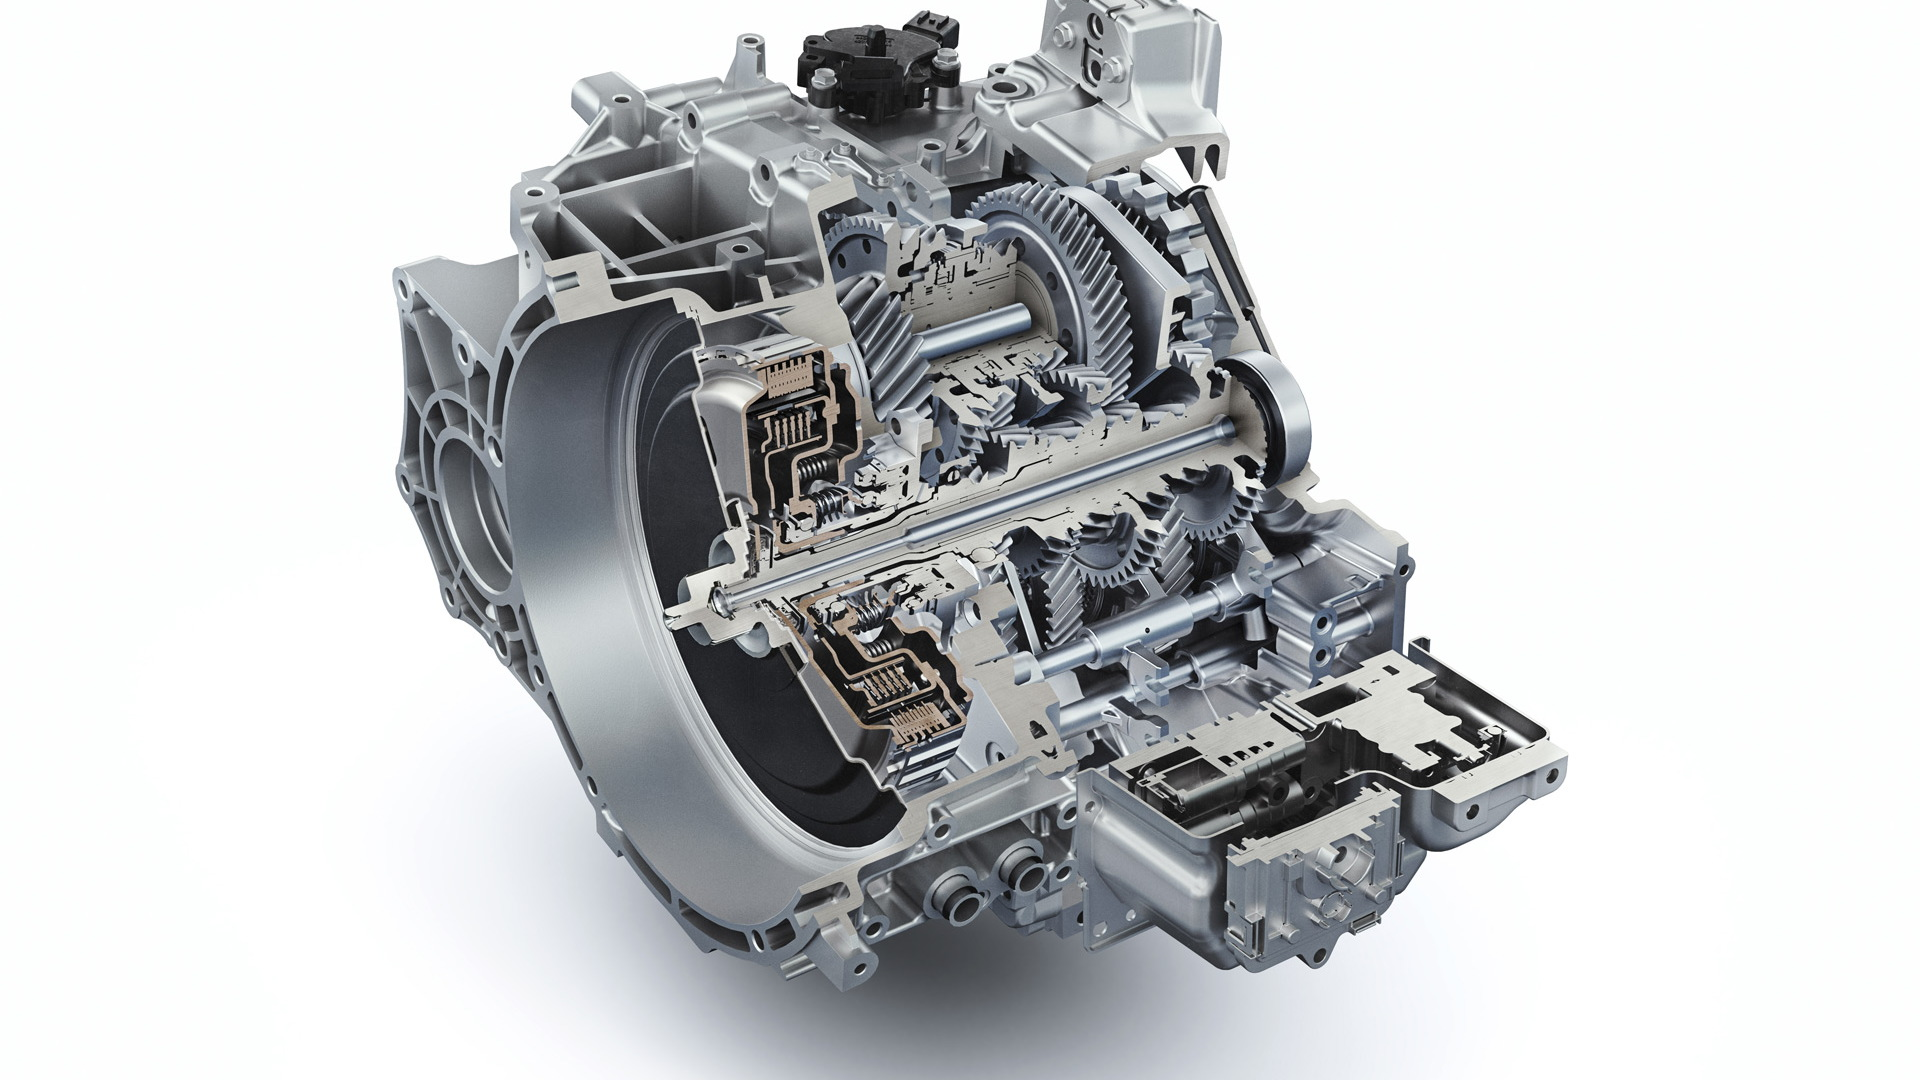 2021 Hyundai Veloster N's dual-clutch transmission